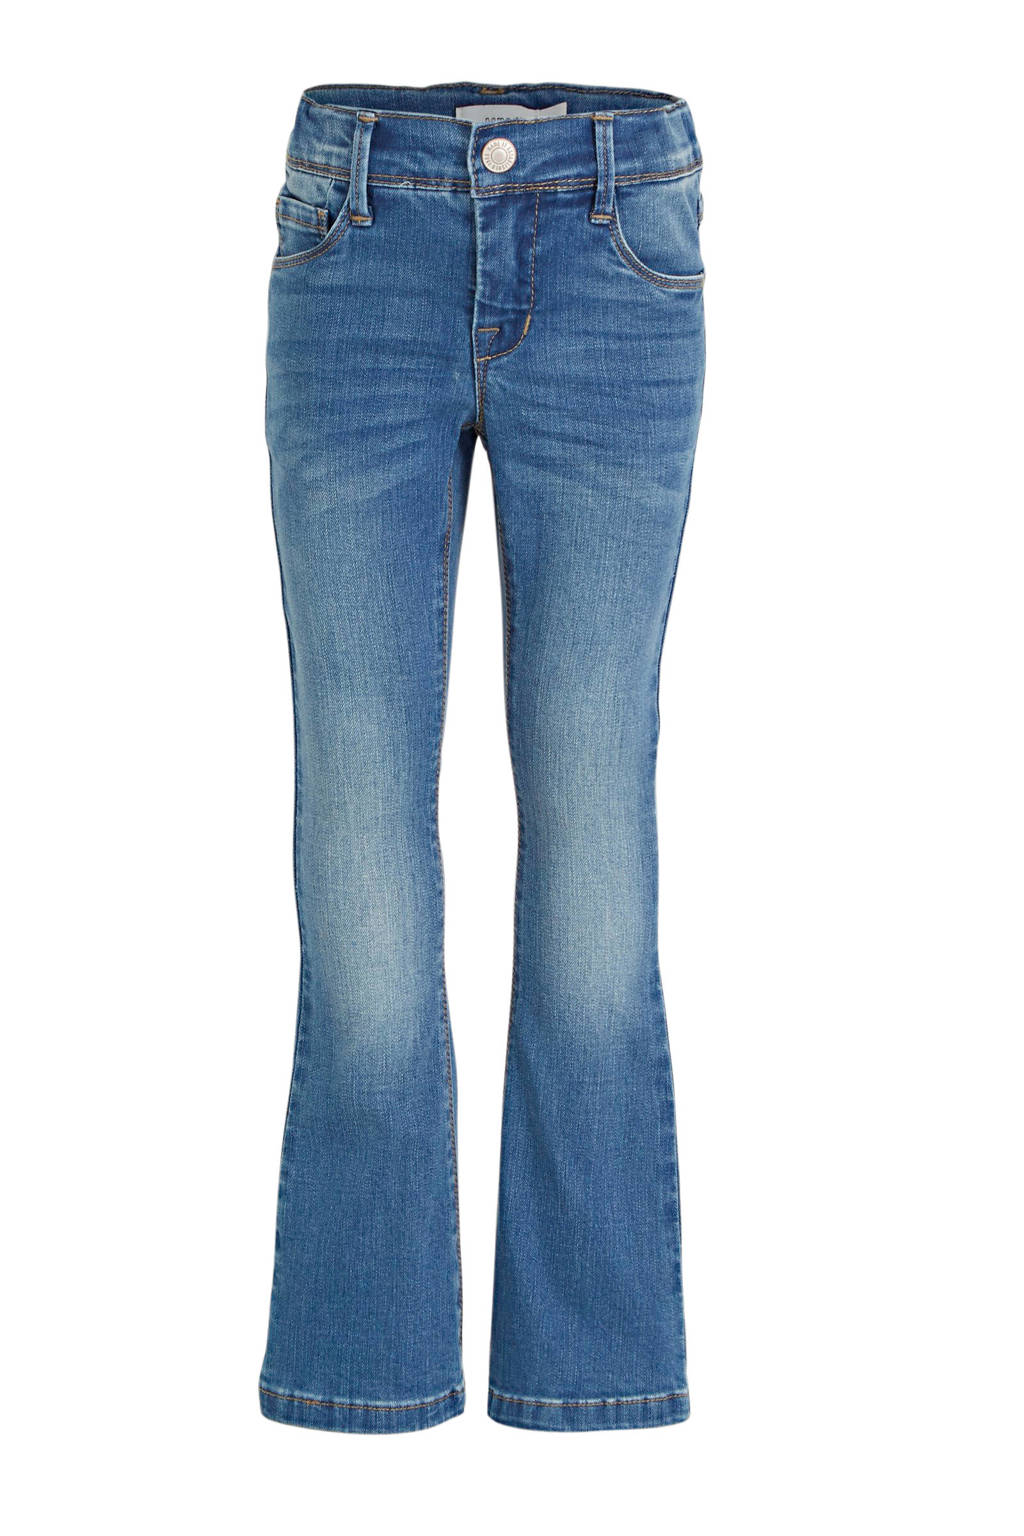 NAME IT KIDS flared jeans Polly stonewashed, Stonewashed